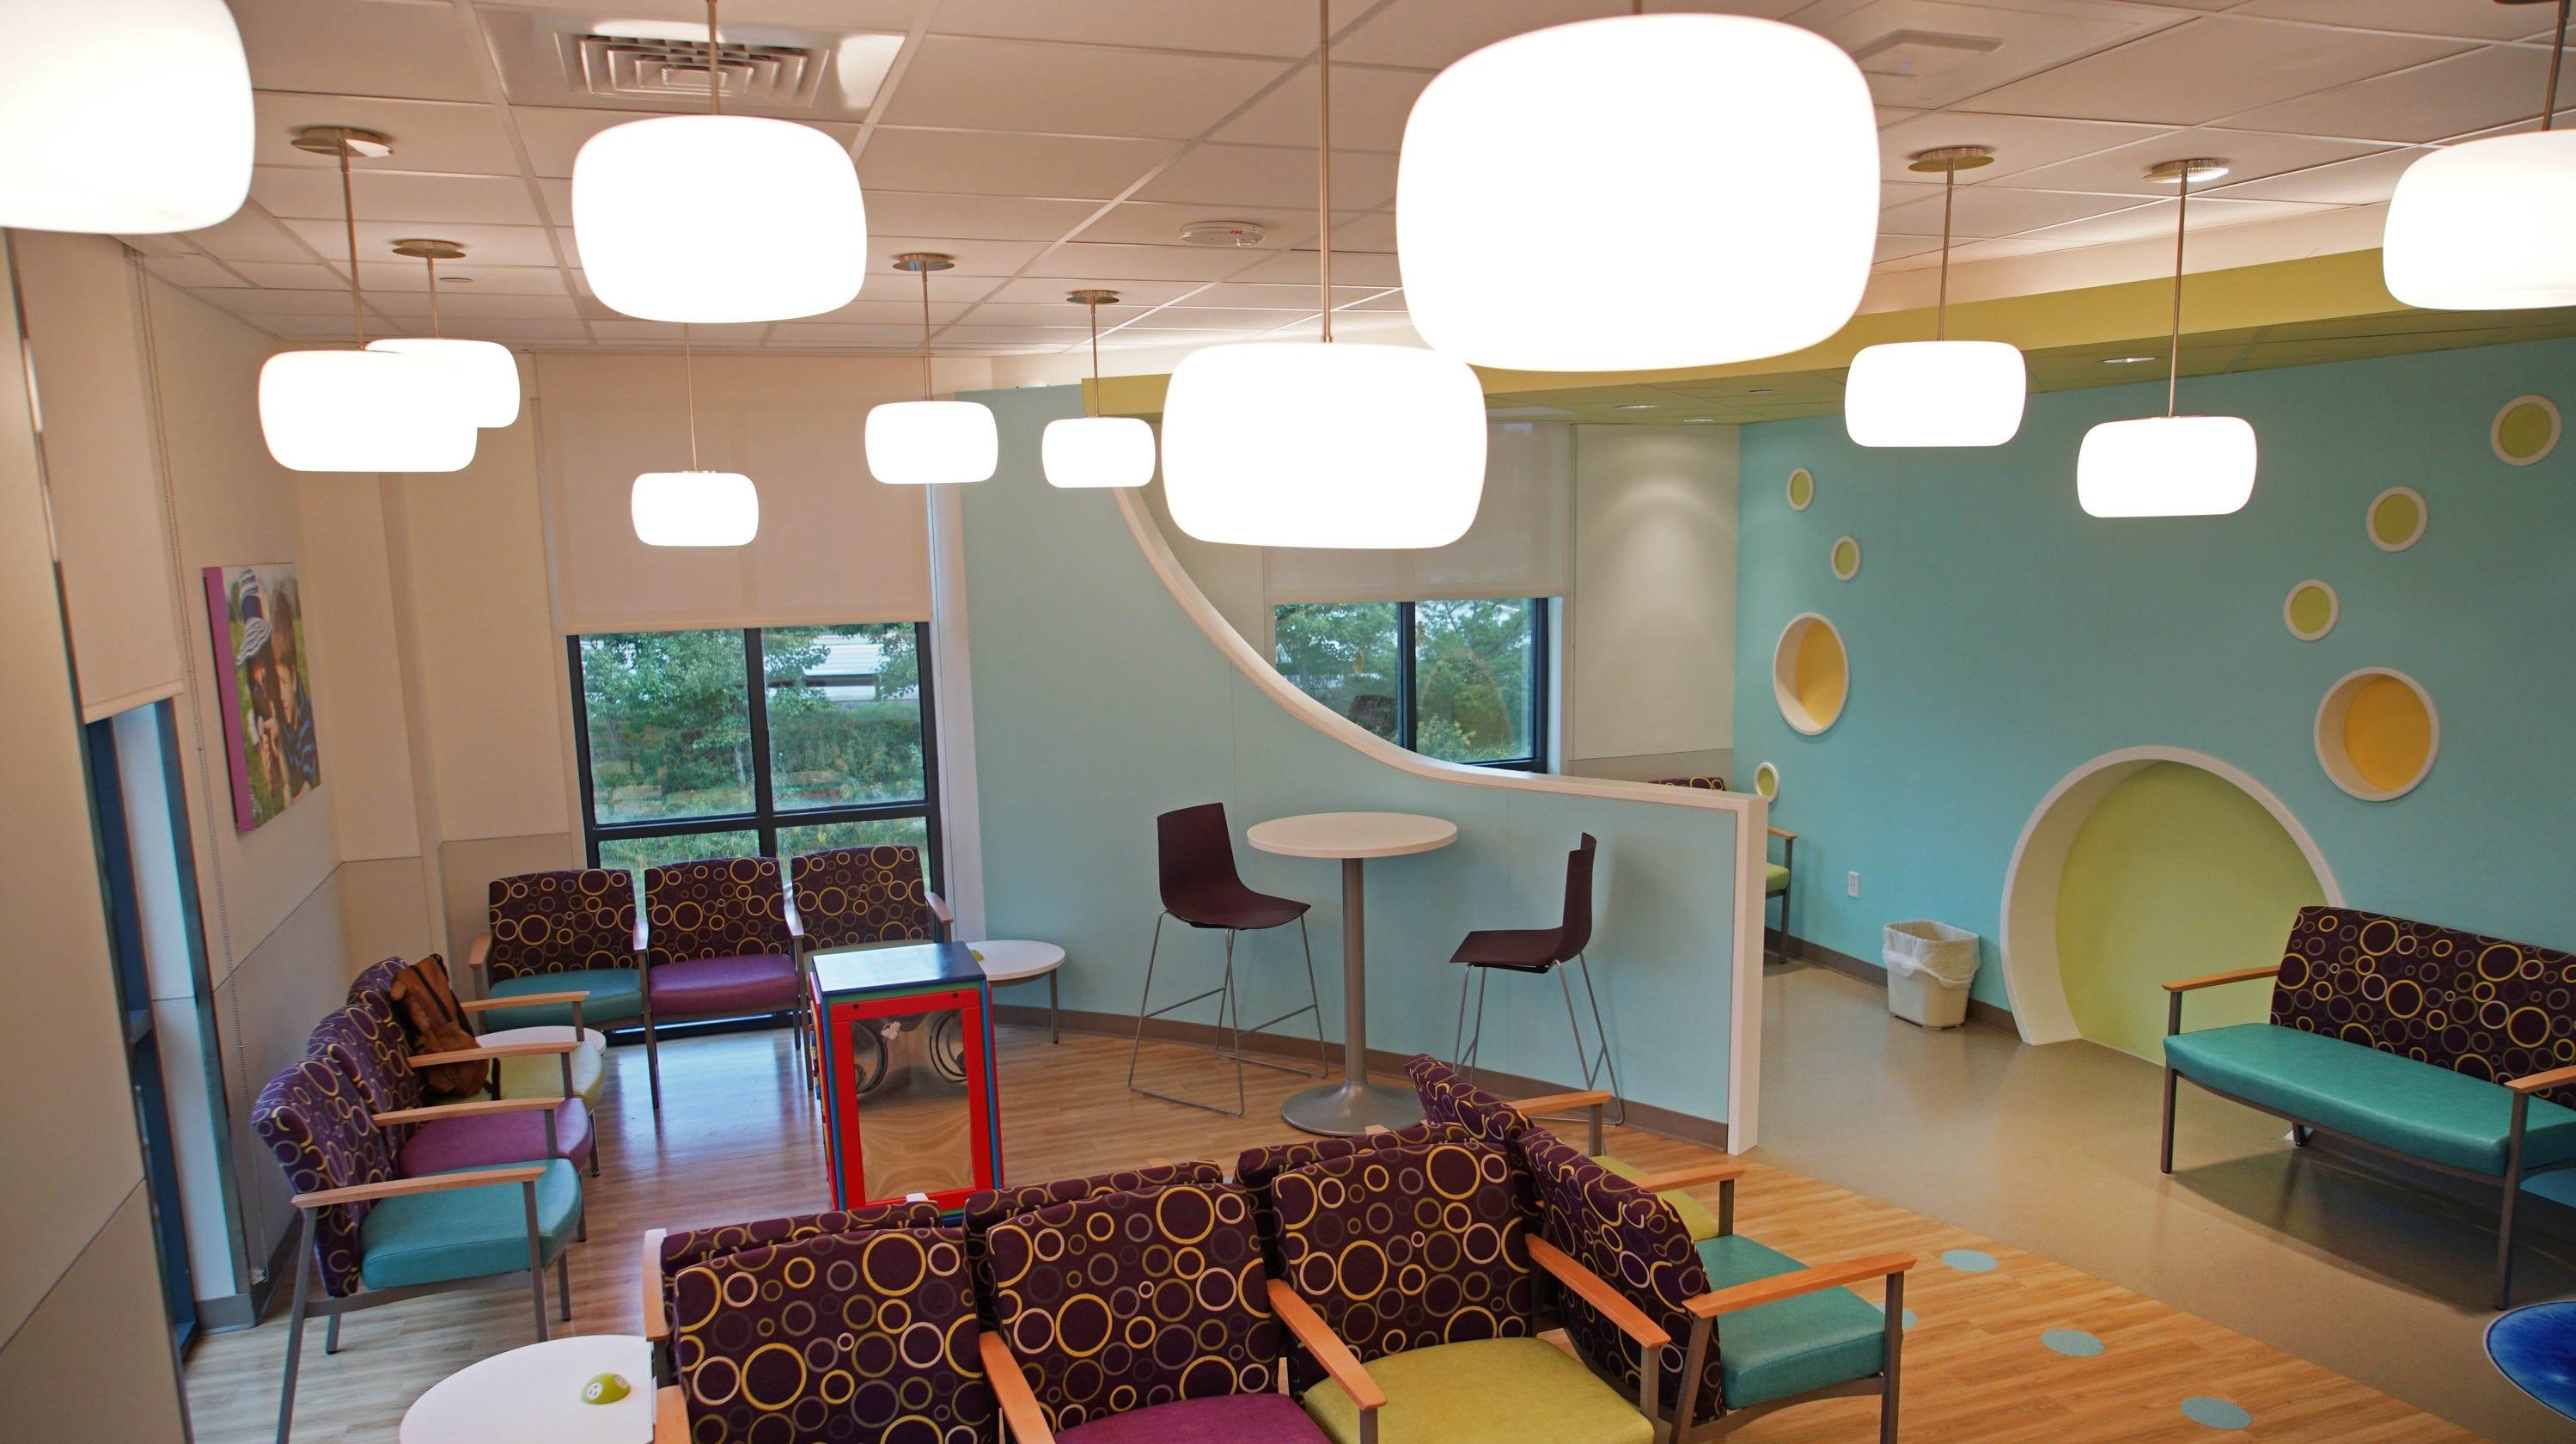 Child Psychiatry Nemours Childrens Health System >> Nemours Opens 20 Million Center For Autism Behavioral Health